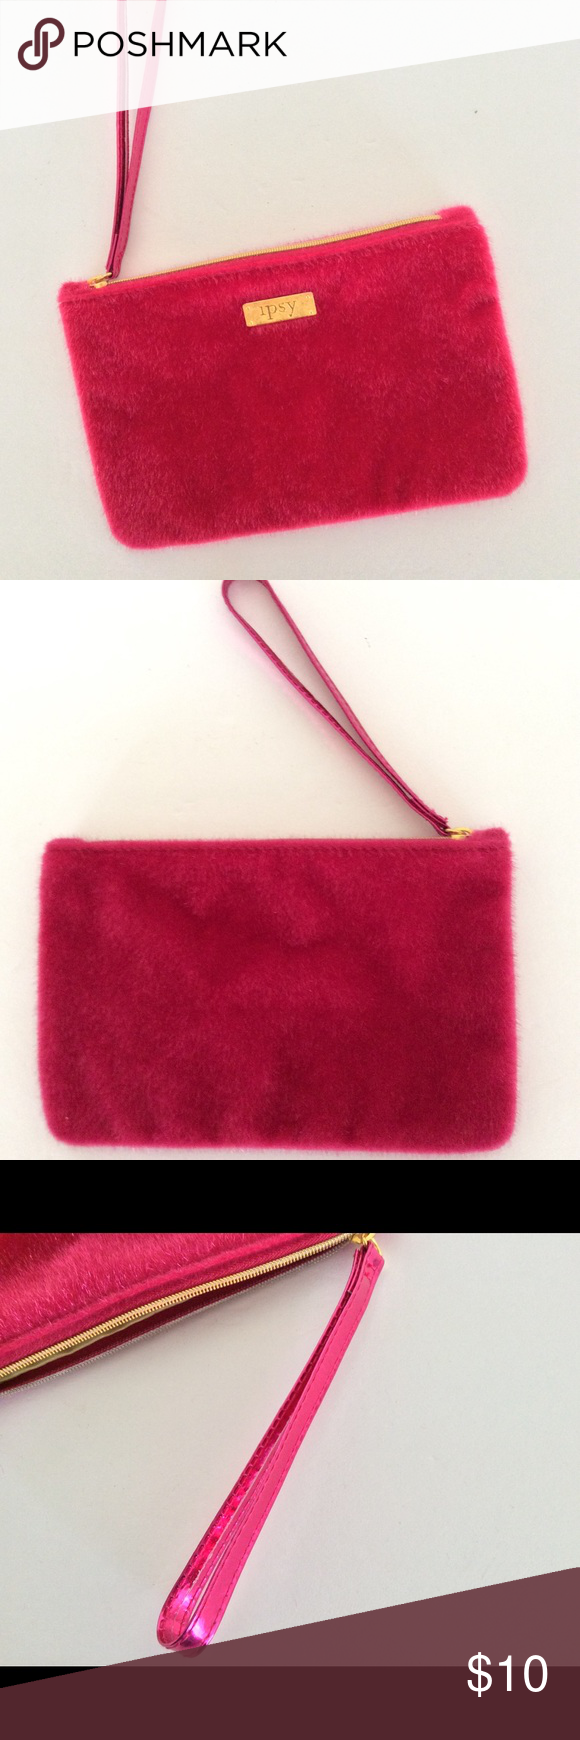 7783e94cf9 Ipsy makeup bag faux fur fuchsia